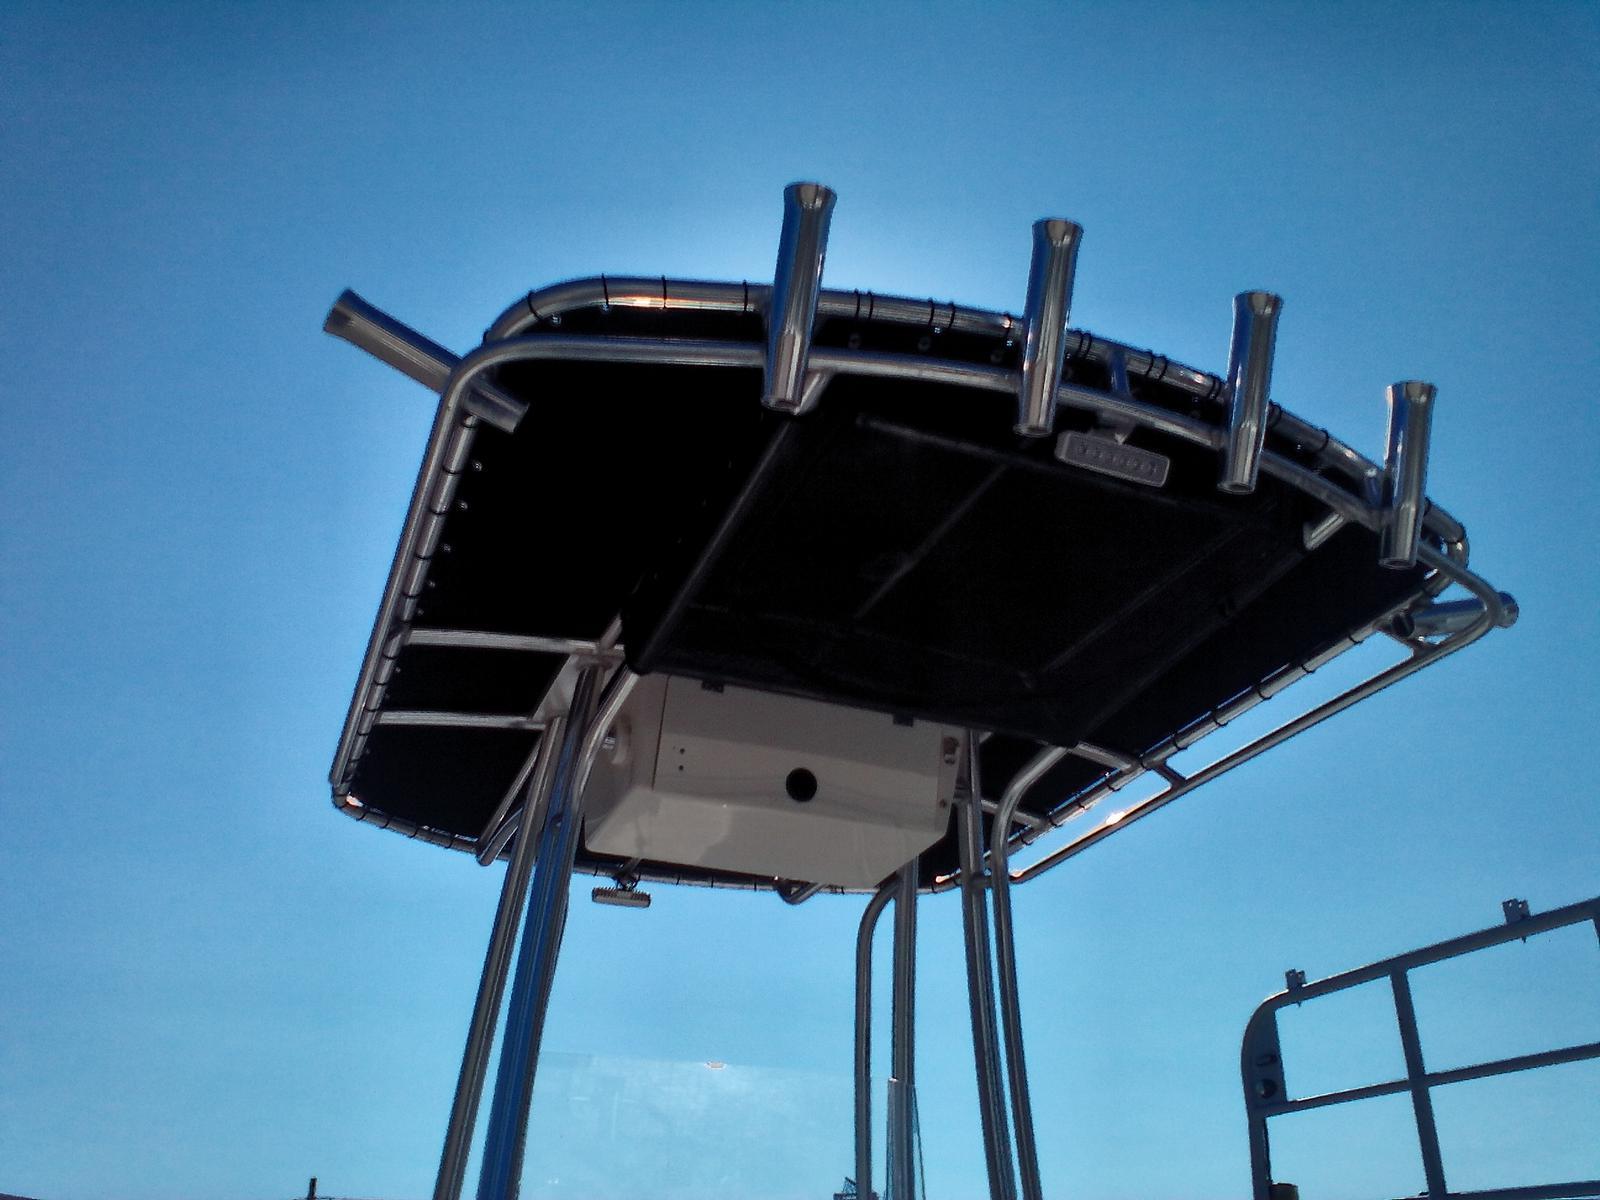 2008 Riddick boat for sale, model of the boat is Bay Runner 2290 & Image # 2 of 6